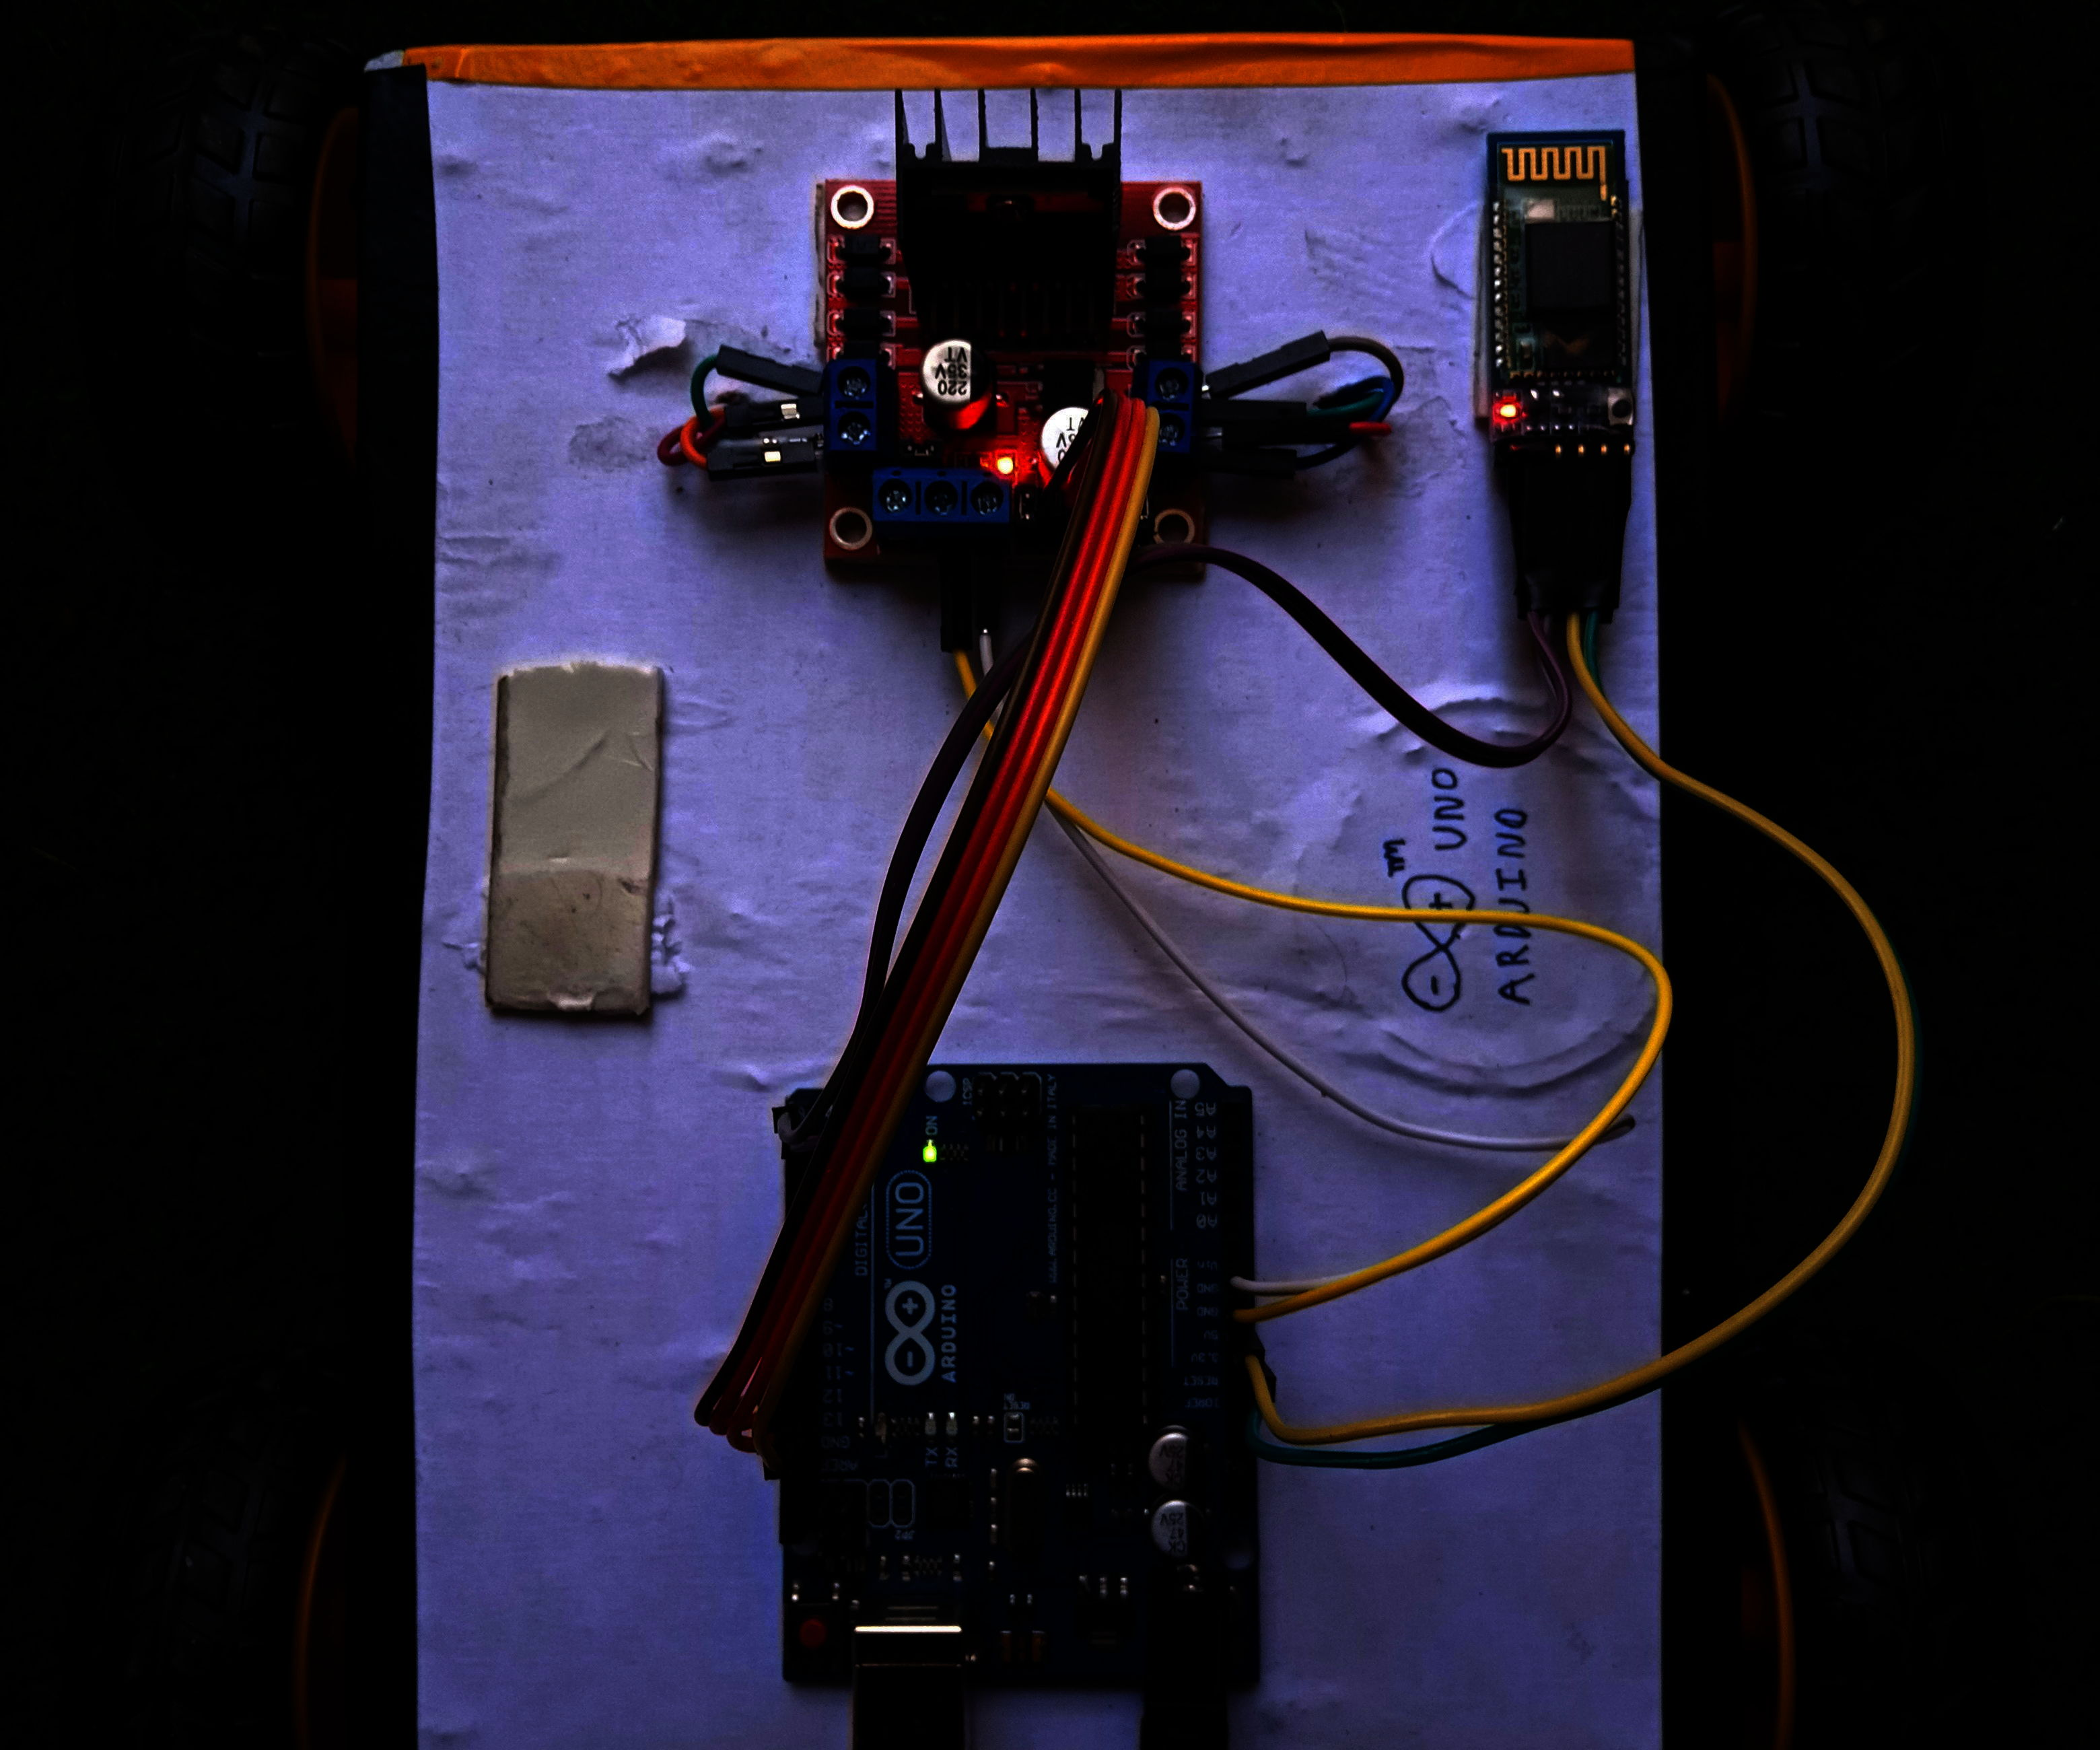 Bluetooth Controlled Car Using Arduino